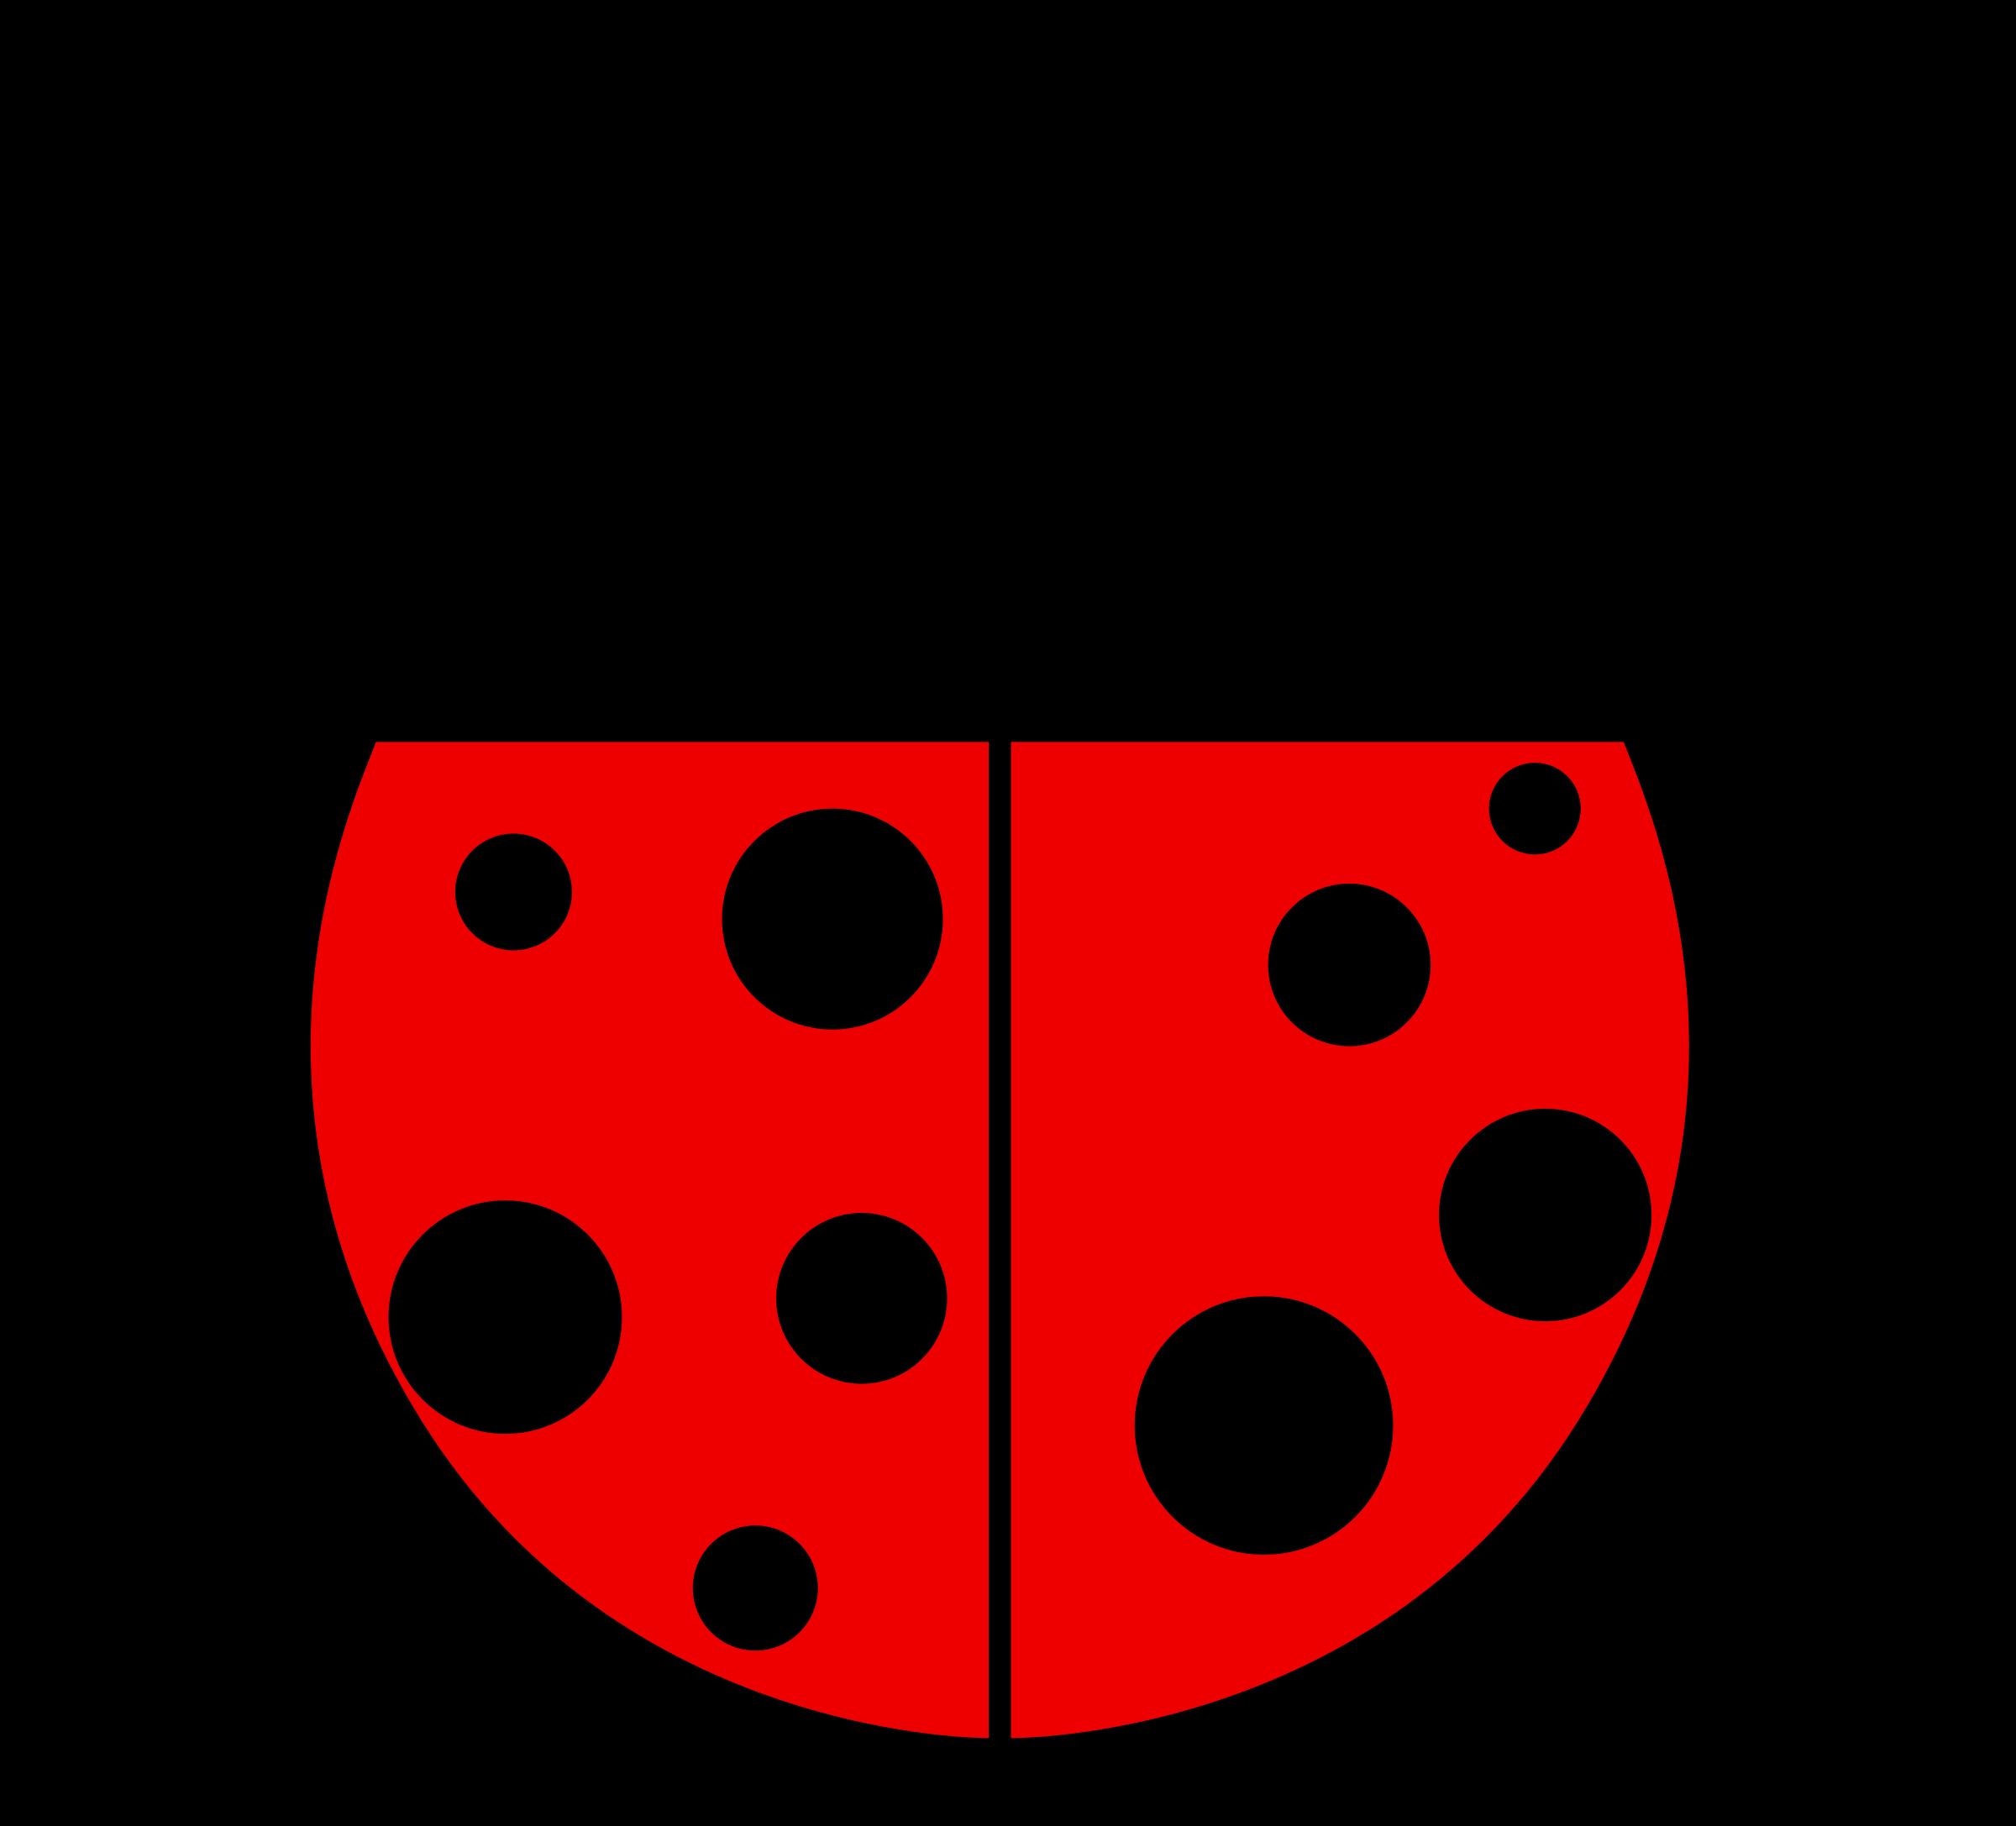 Ladybug clipart simple. Flat colors big image